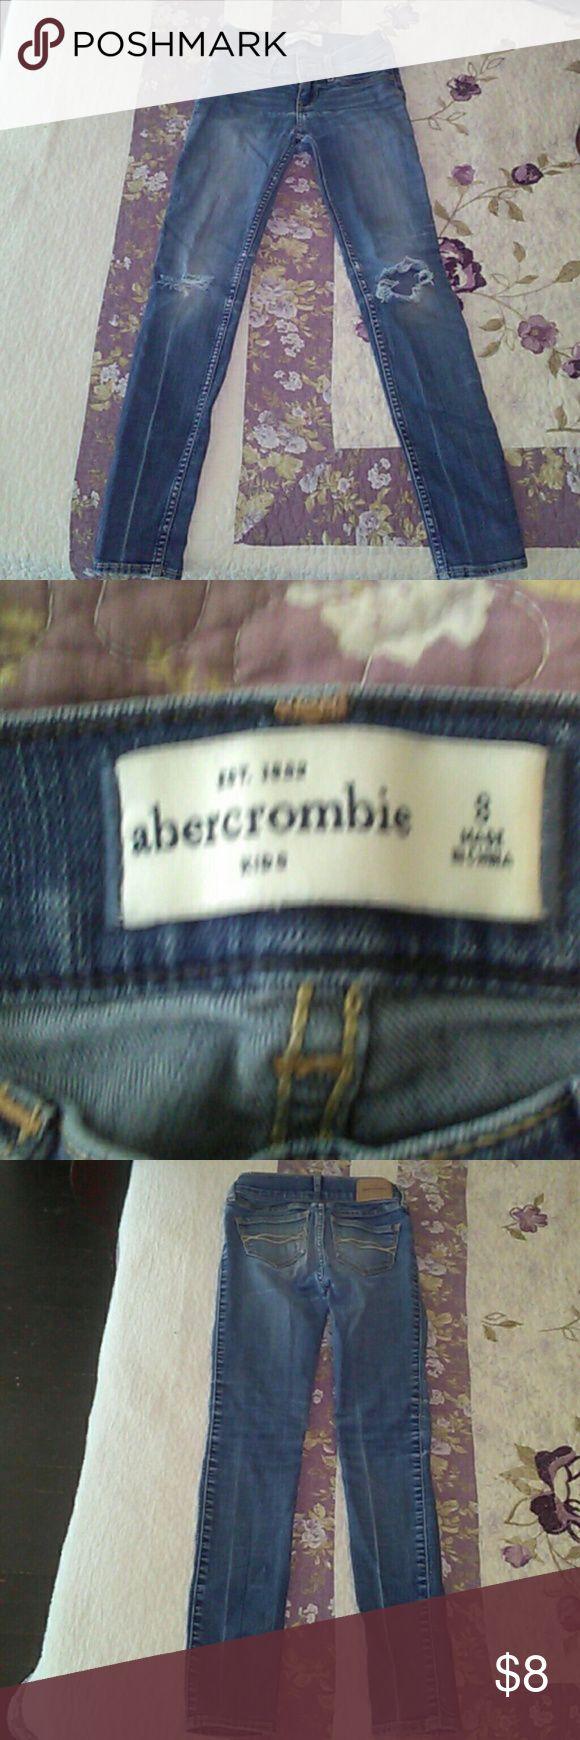 Girls Abercrombie Skinny Jeans Sz 8 Girls Abercrombie Skinny Jeans Sz 8. In great, used condition. abercrombie kids Bottoms Jeans